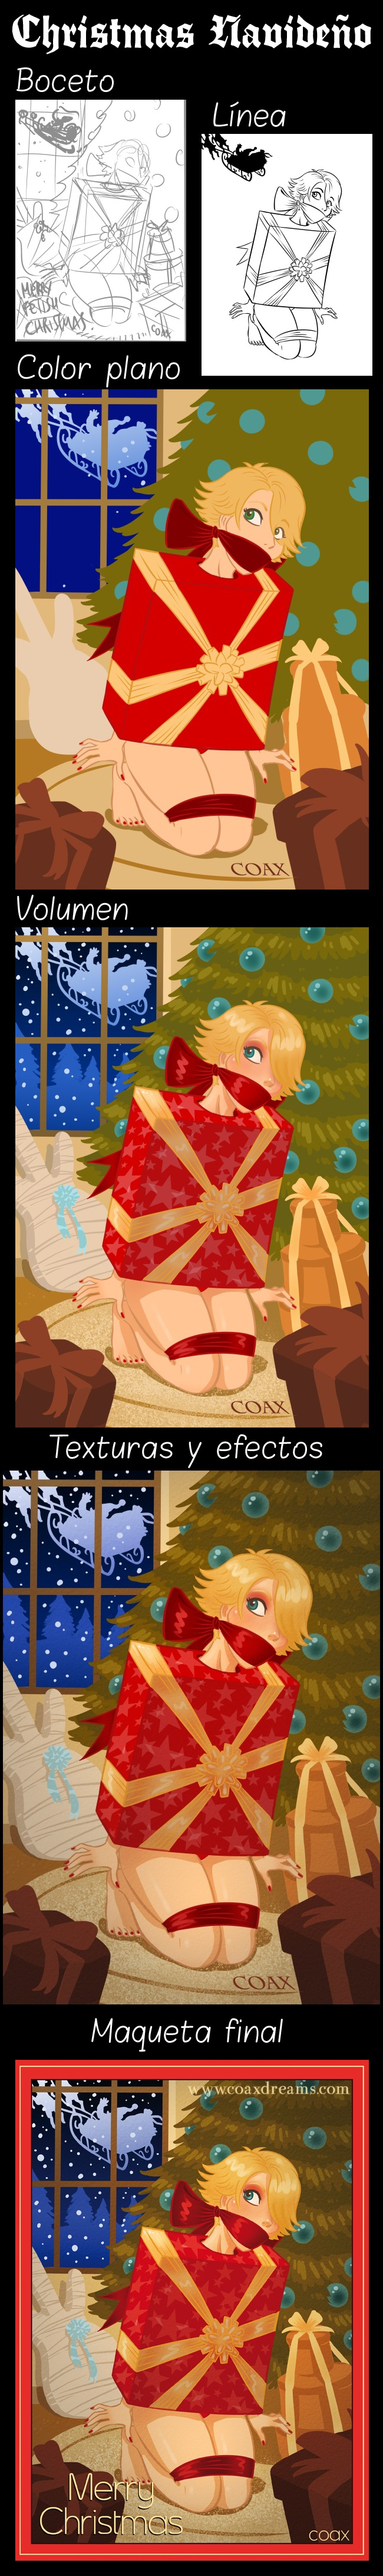 Christmas_navideño_650pix